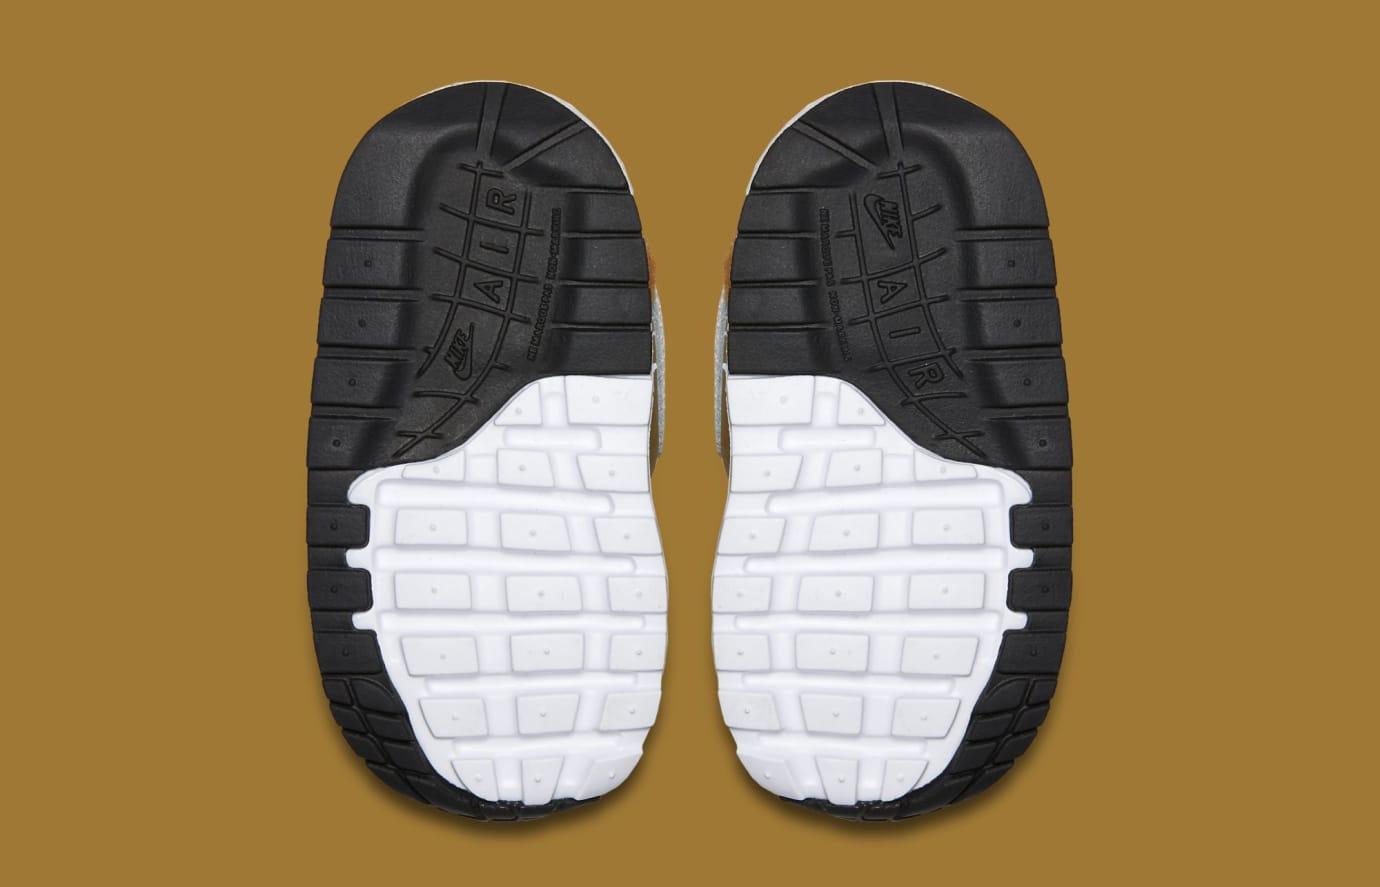 Nike Air Max 1 Premium TD 'Dark Curry/Sport Blue/Black/True White' AT3360-700 (Soles)